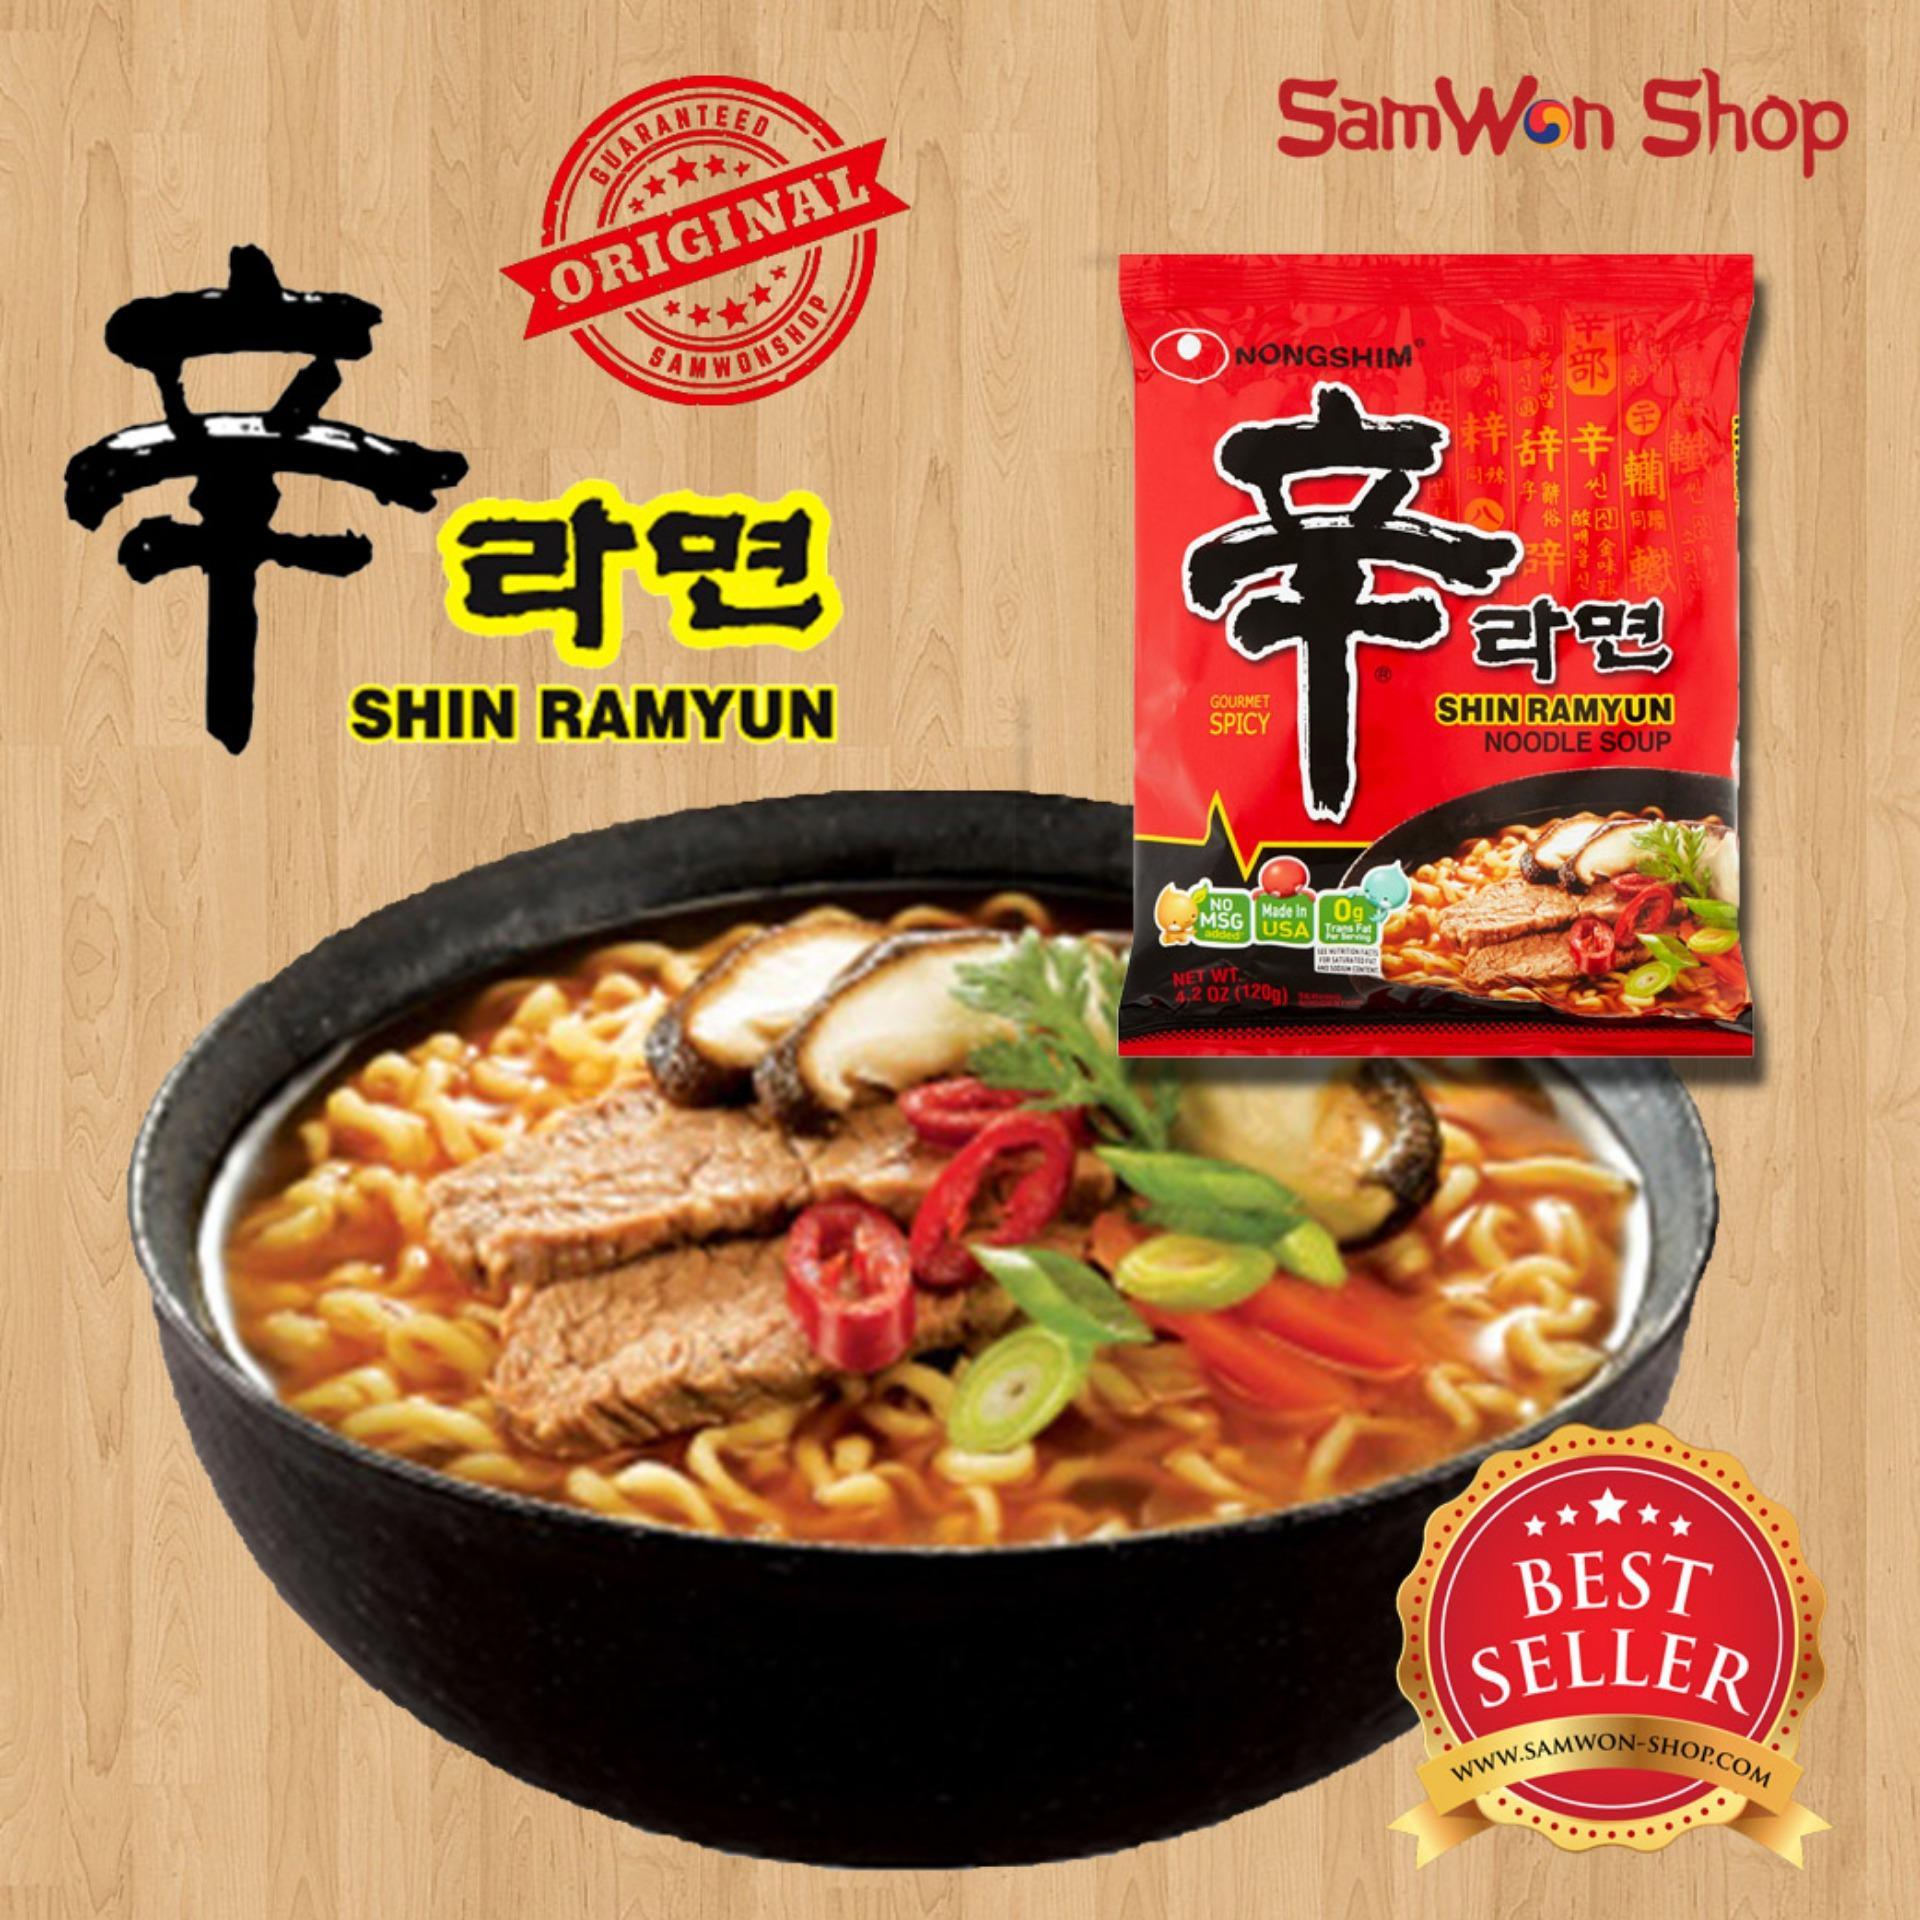 Buy Sell Cheapest Kurma Khalas Samwon Best Quality Product Deals Tteokbokki Tokpoki Only 500 Gram Shin Ramyun 125gr Mie Instan Korea